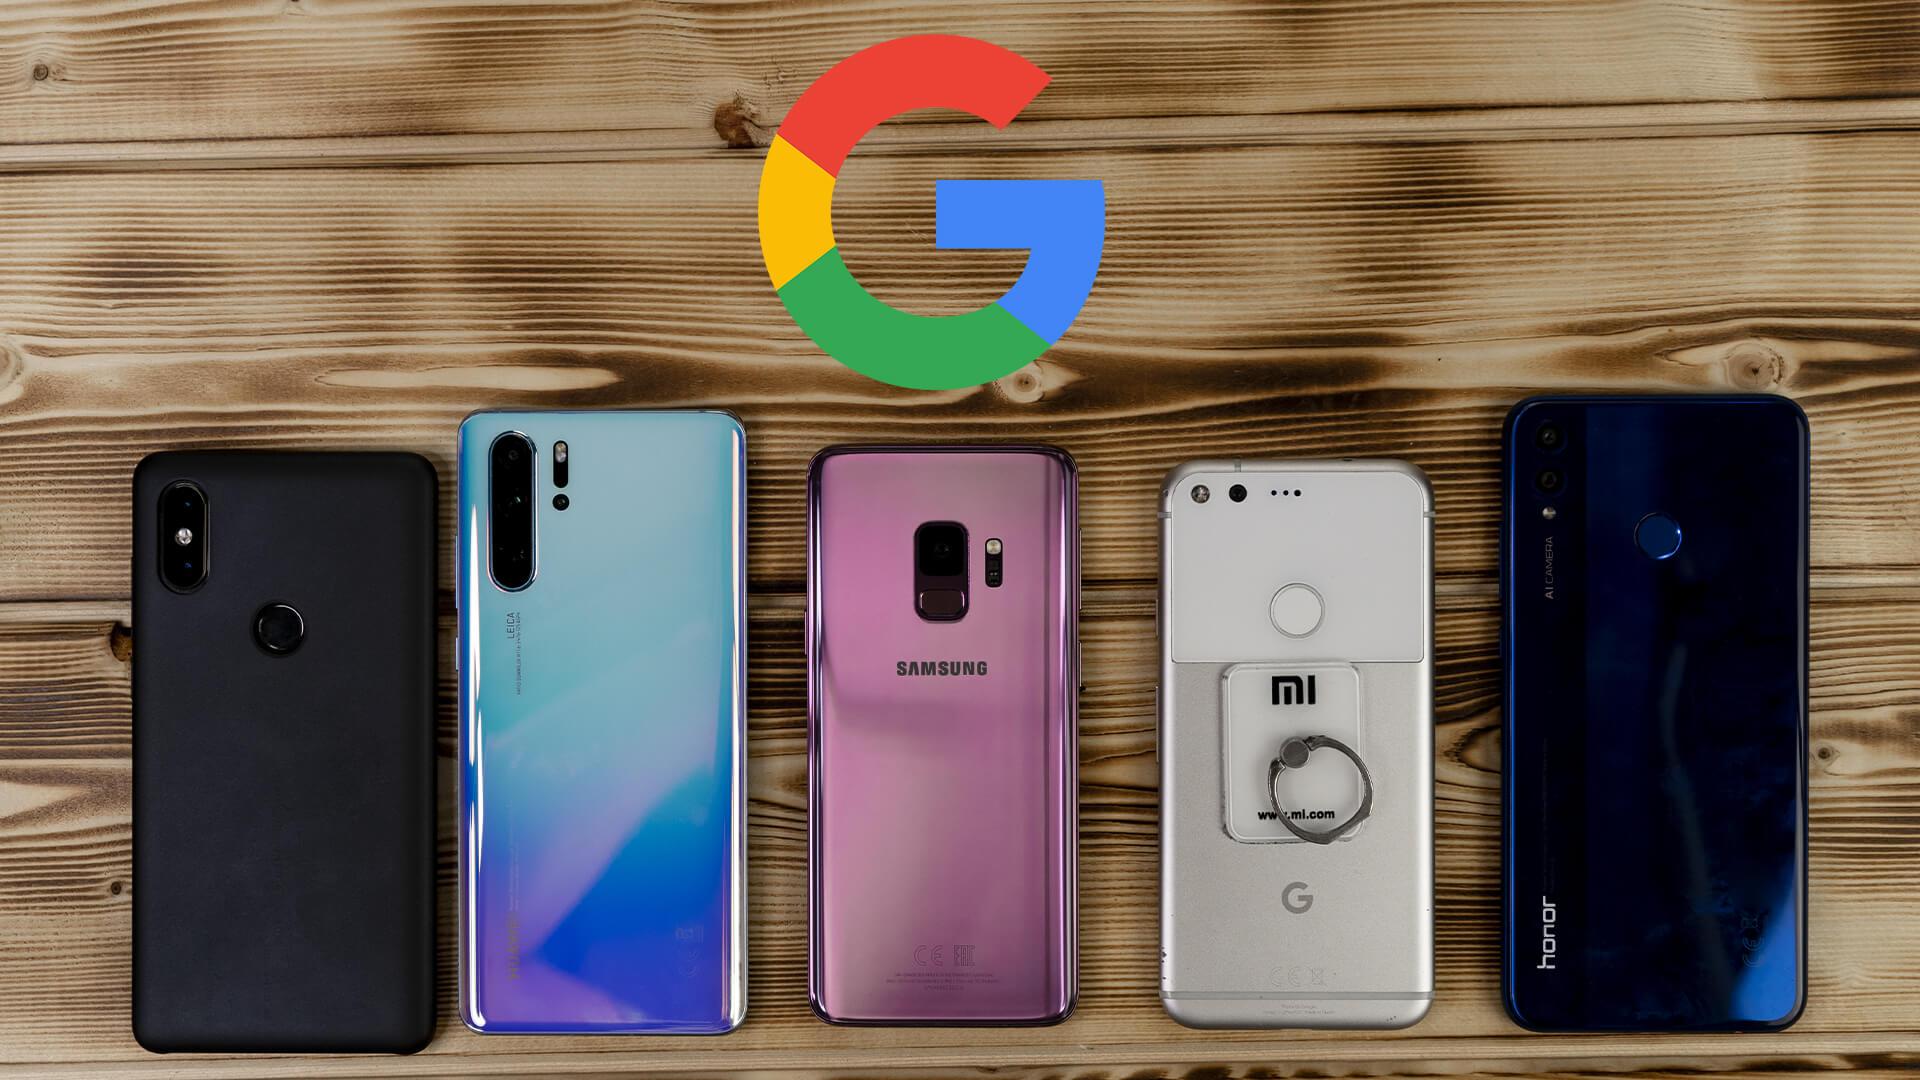 Как удалить Google-аккаунт на любом Android-смартфоне